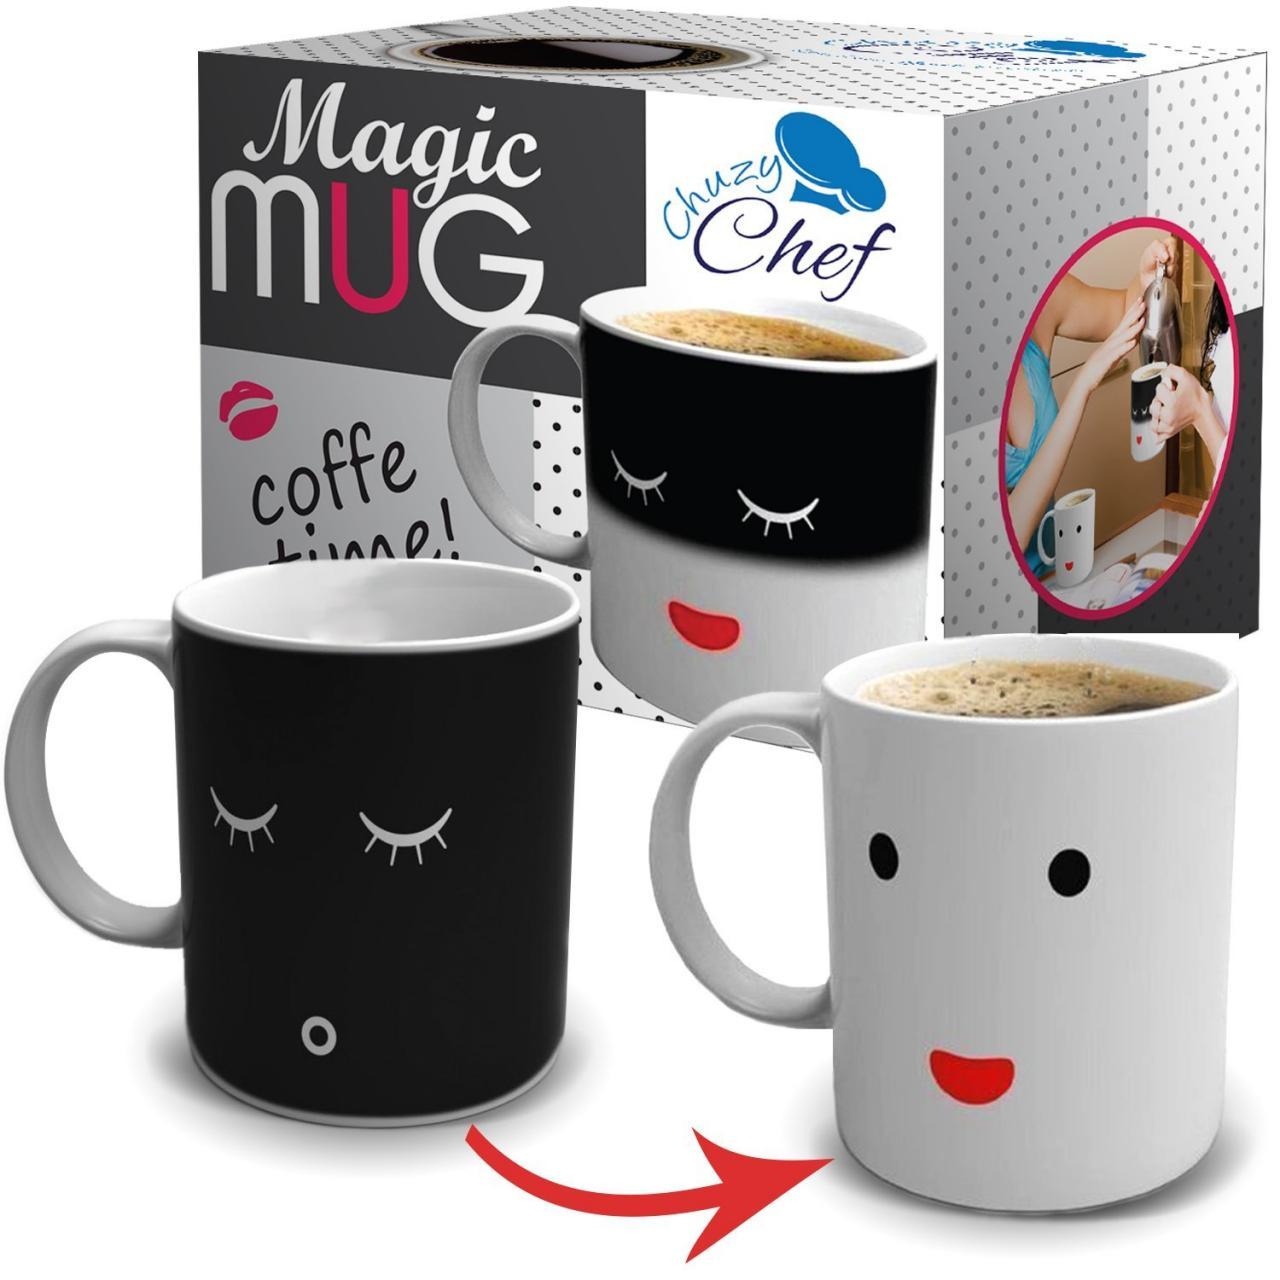 Amazon Mug 10 คีย์สินค้า ปี 2017 - อัพเดทข้อมูลสินค้าก่อนใครในประเทศไทย!